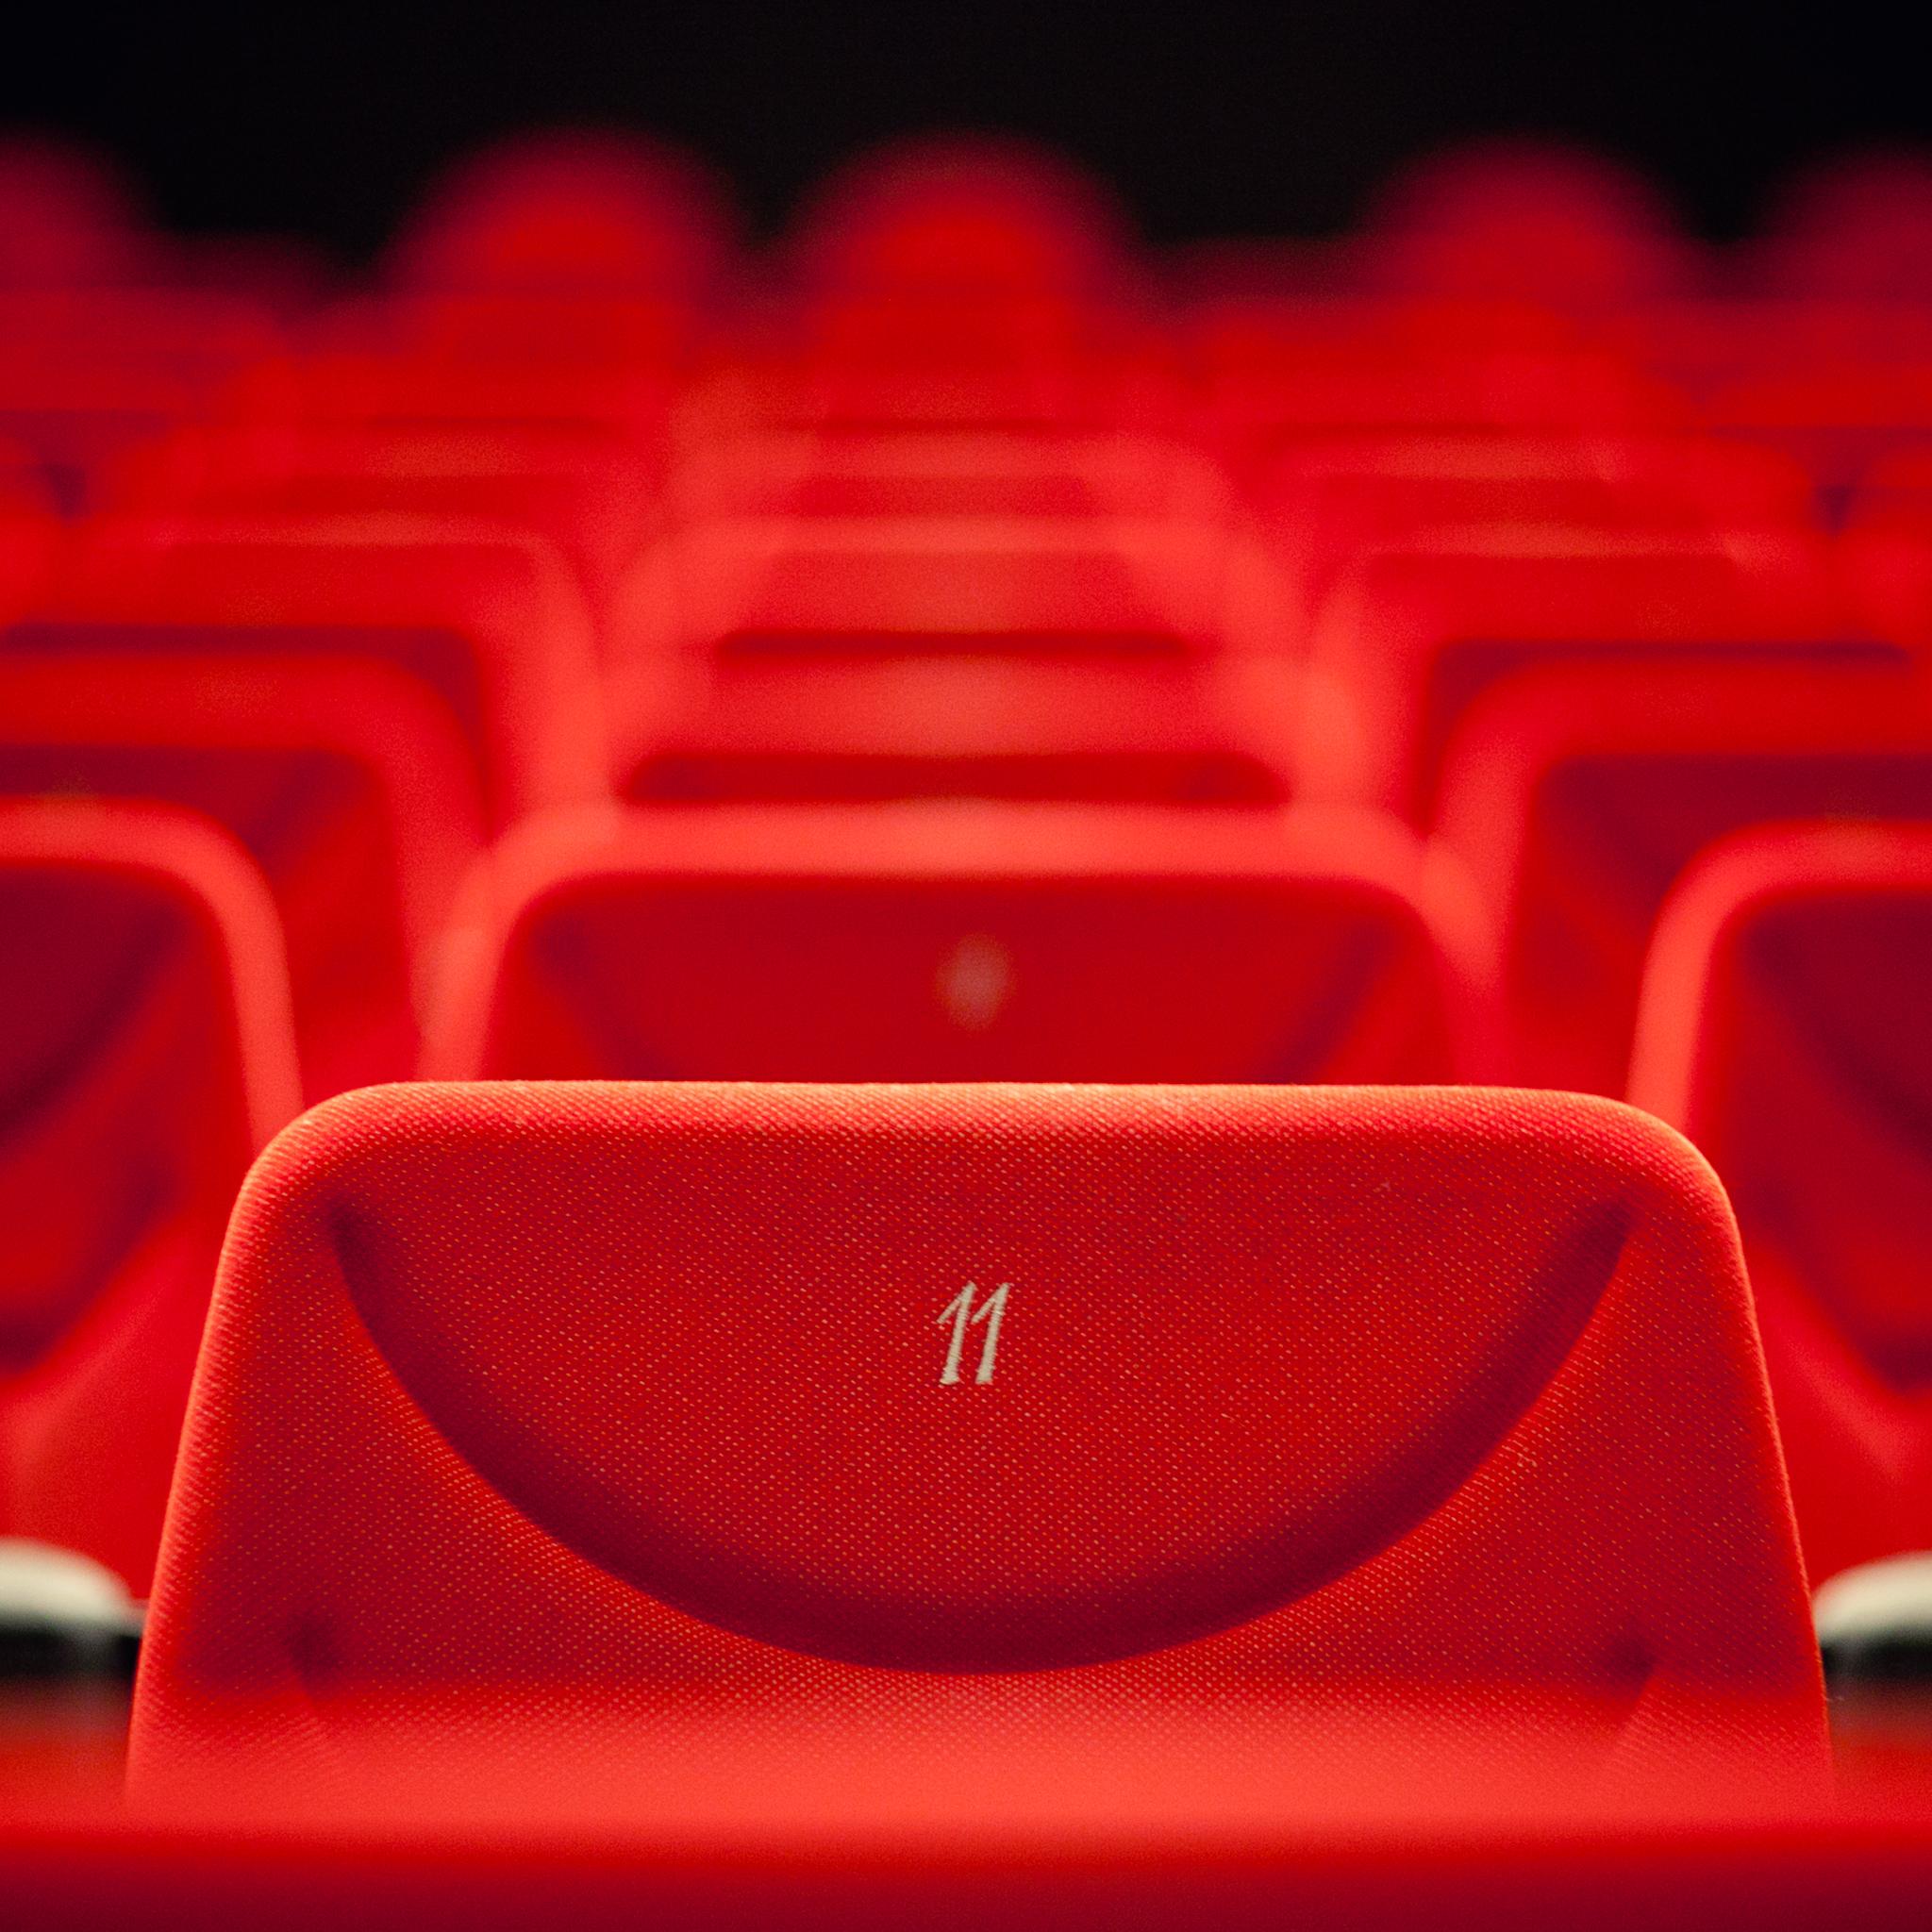 Cinema-Chair-3Wallpapers-ipad-retina